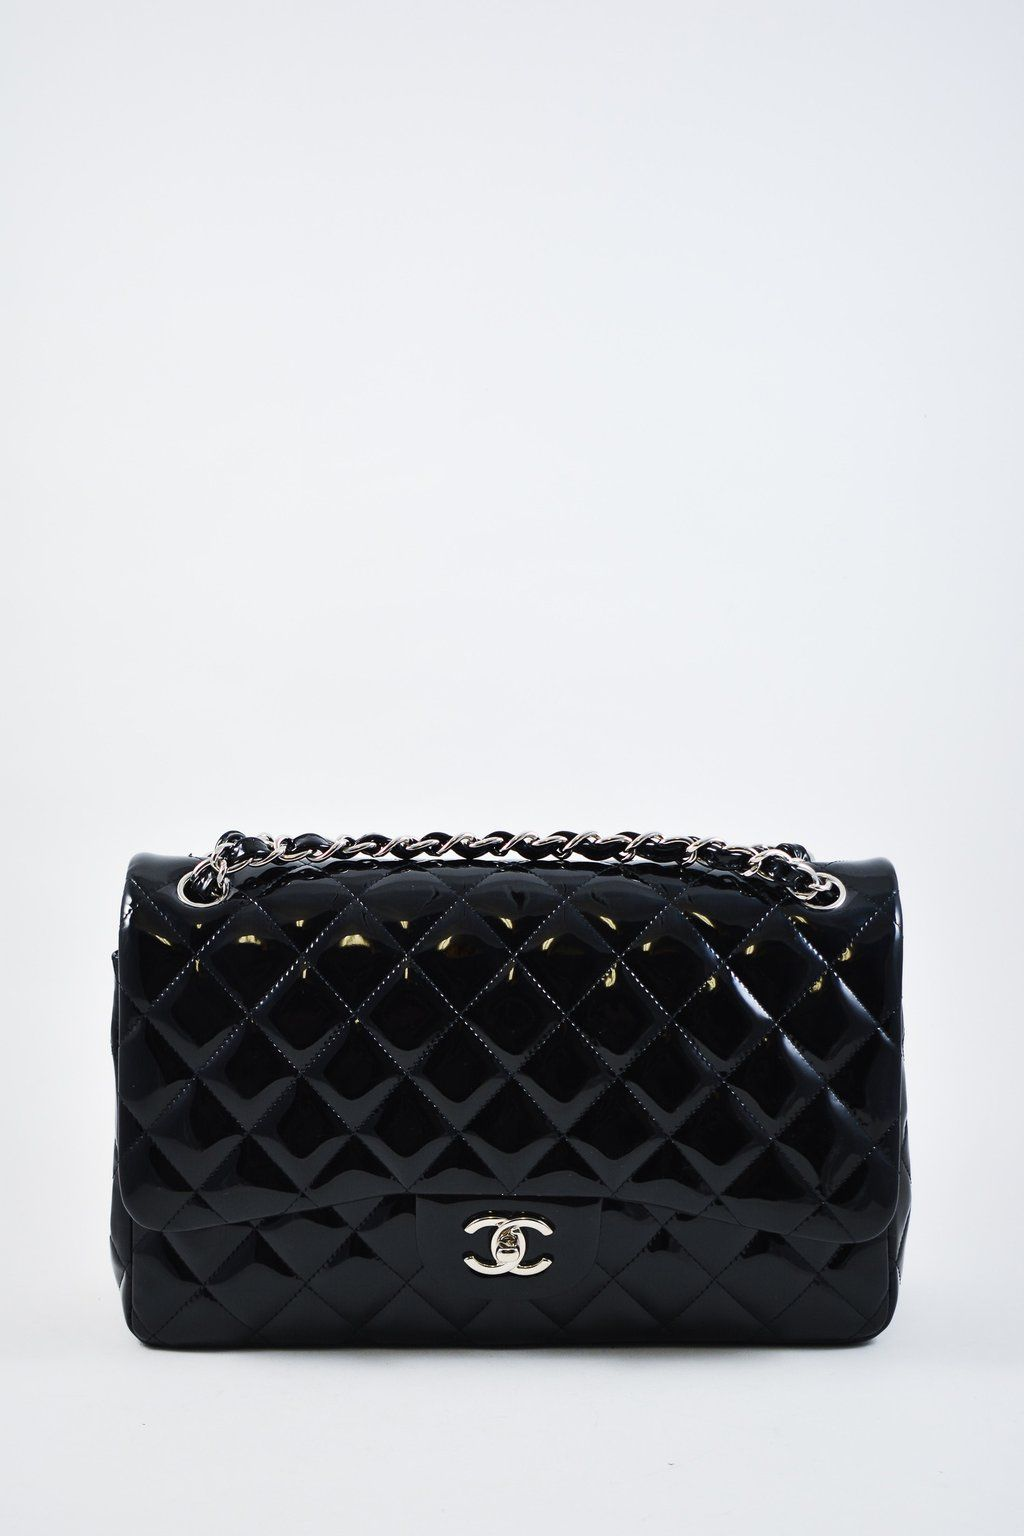 089b1dabbc803a Chanel Black Jumbo Patent Double Flap Bag #MineAndYours. Chanel Black Jumbo  Patent Double Flap Bag #MineAndYours Designer Consignment ...